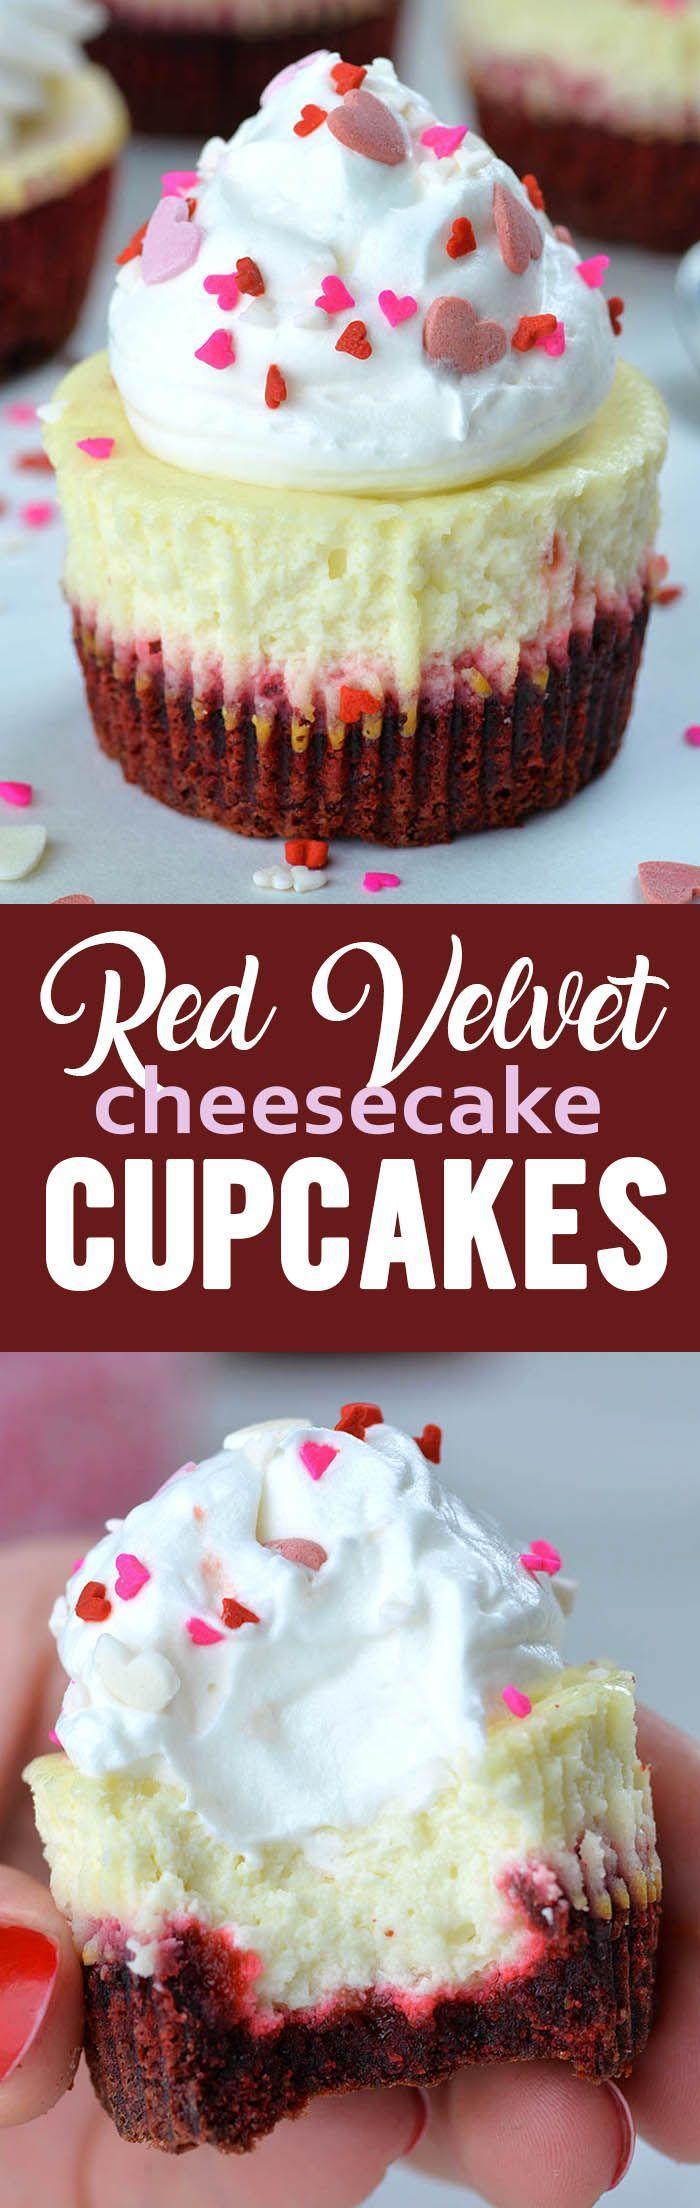 Red Velvet Cheesecake Cupcakes